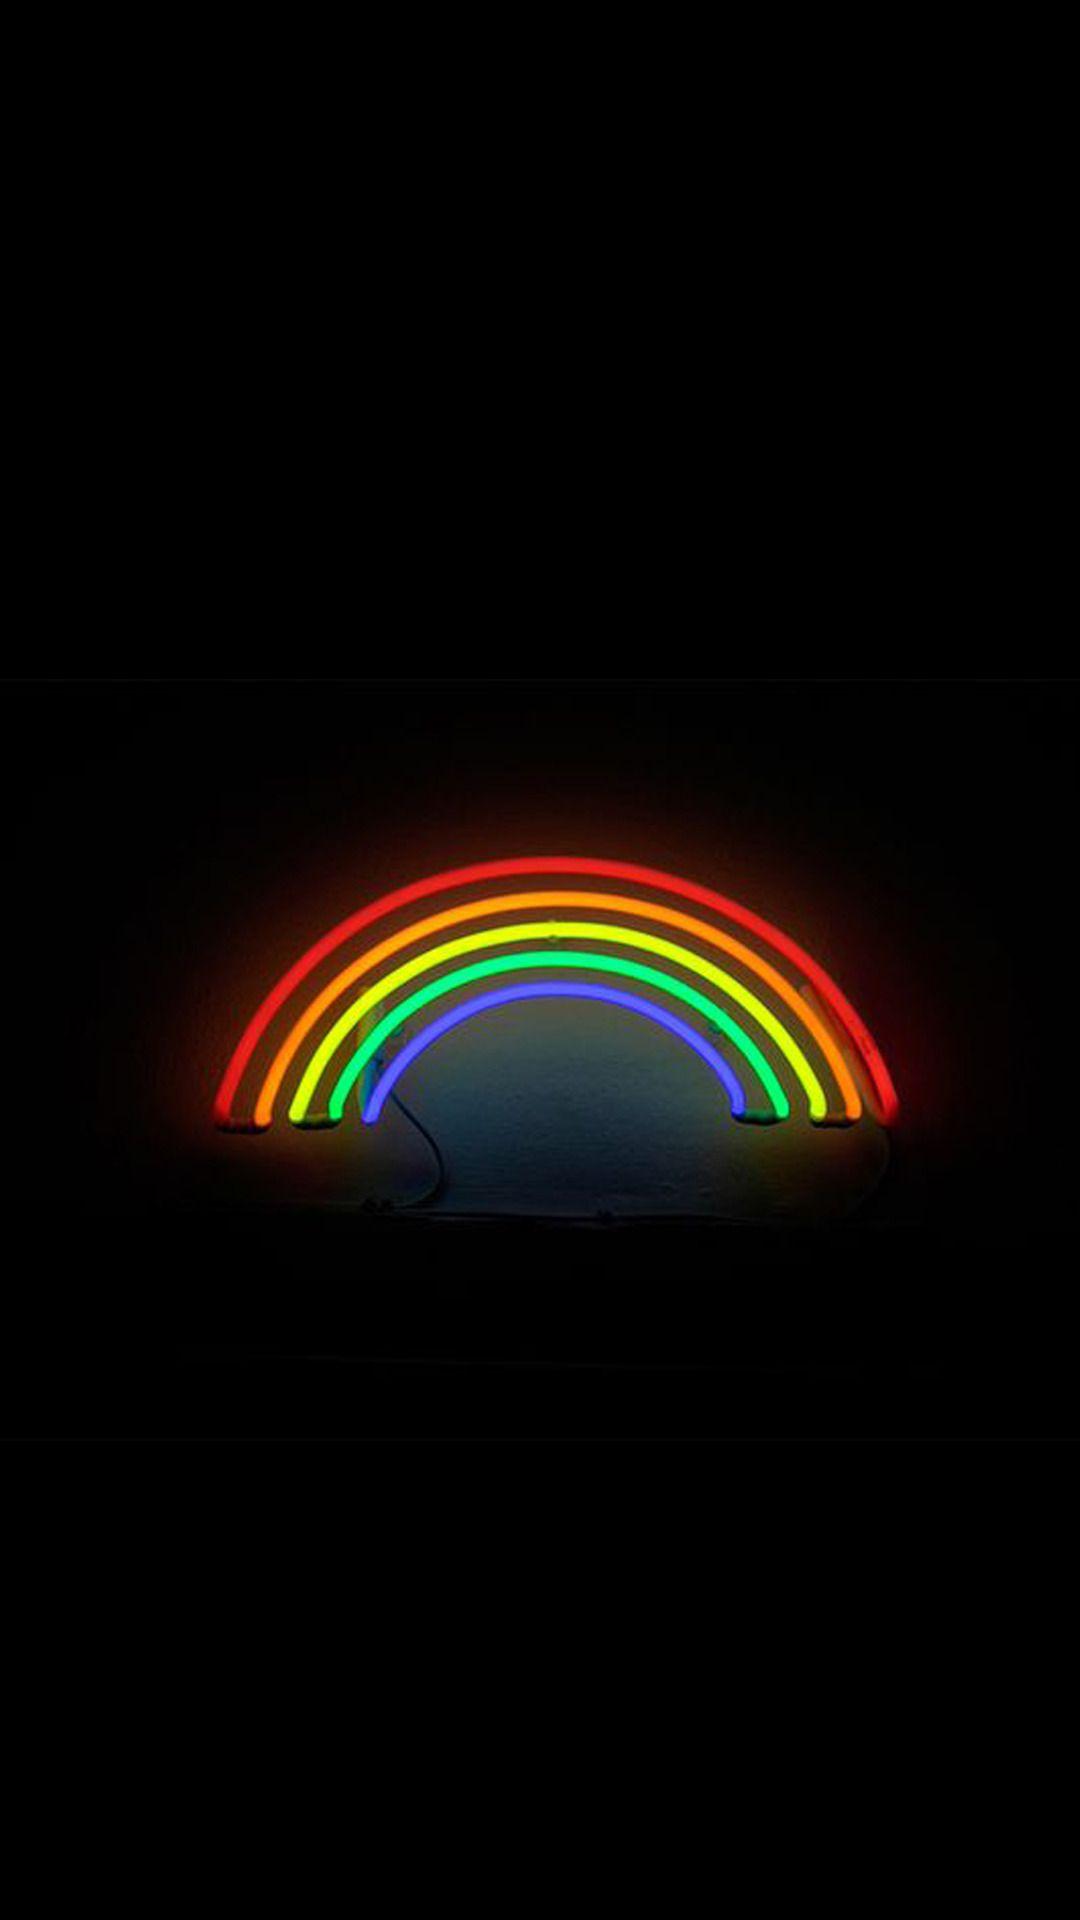 RAINBOW | Rainbow wallpaper iphone, Rainbow wallpaper ...